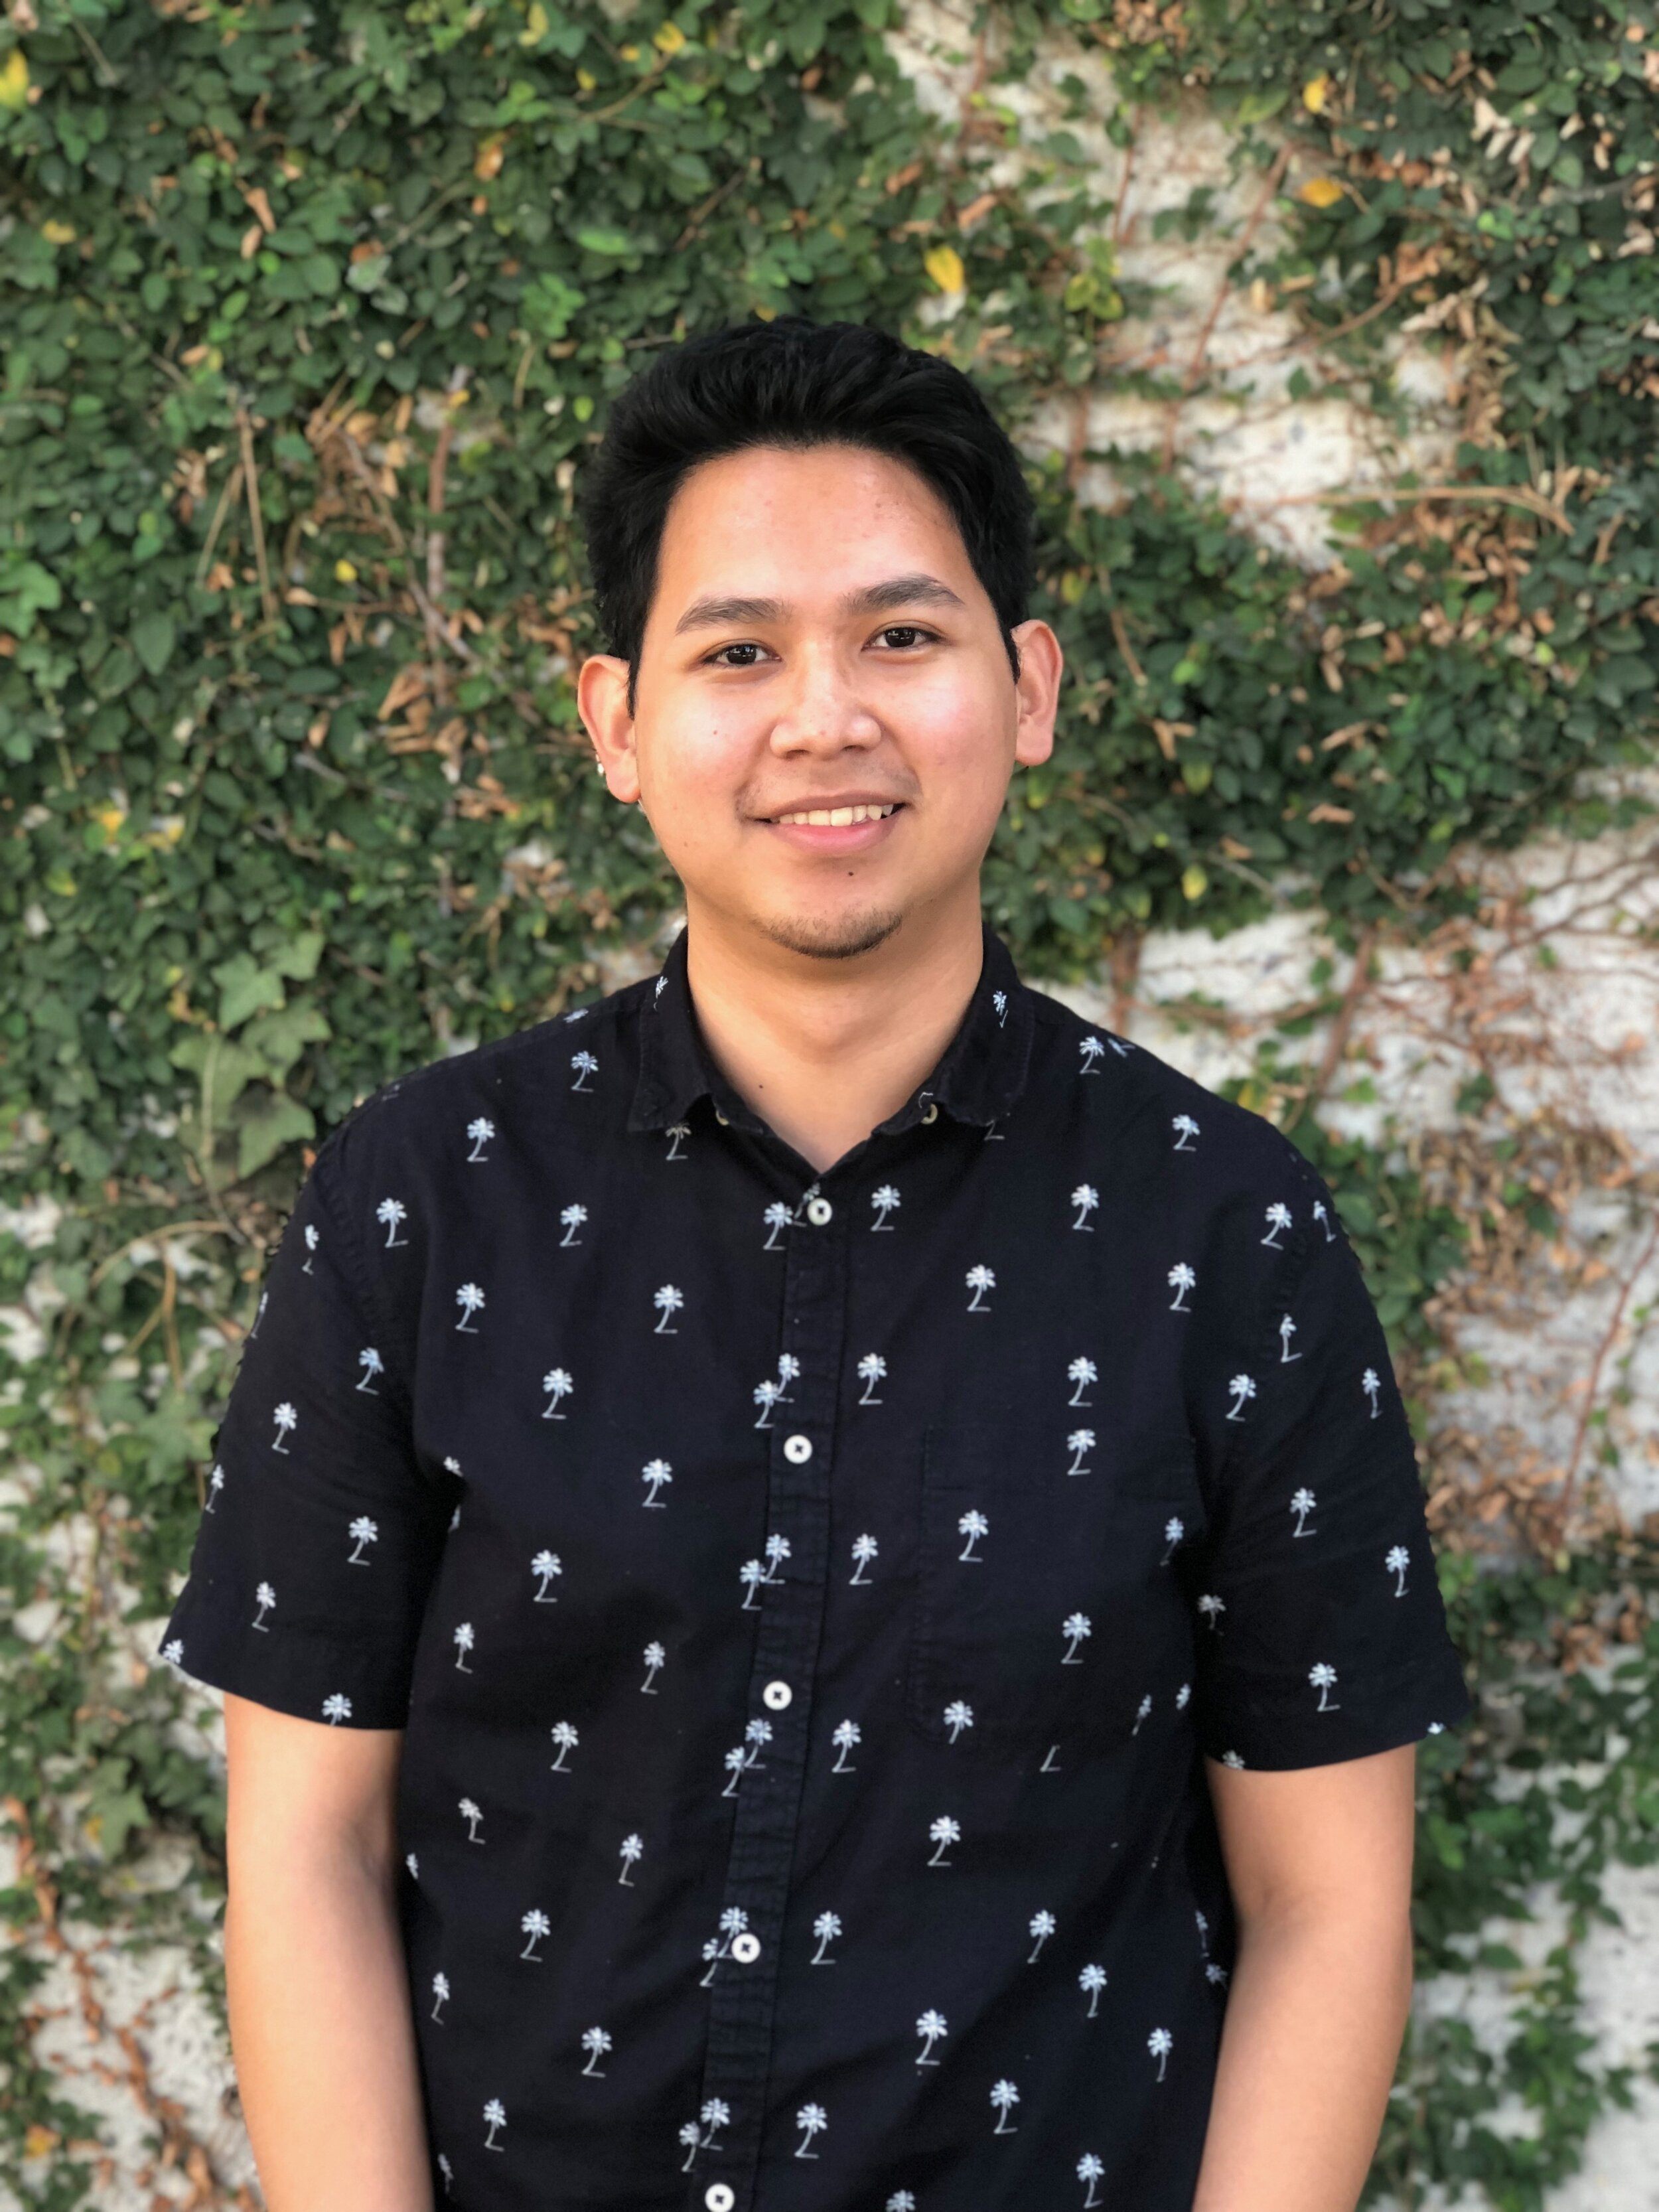 Peter Pavilando, B.S. SAT and ACT Math, Chemistry, and Physics TUTOR